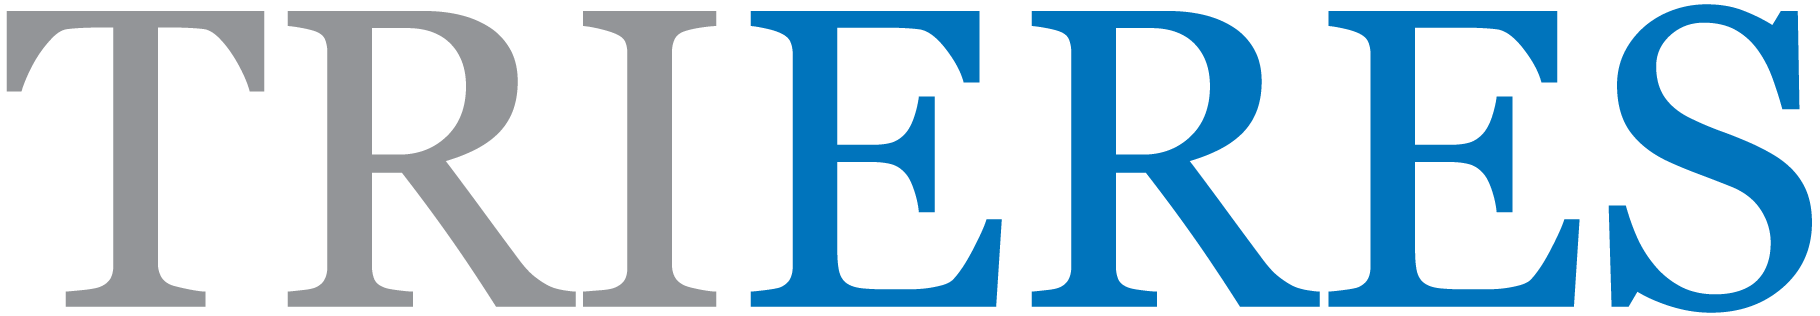 trieres_logo_text